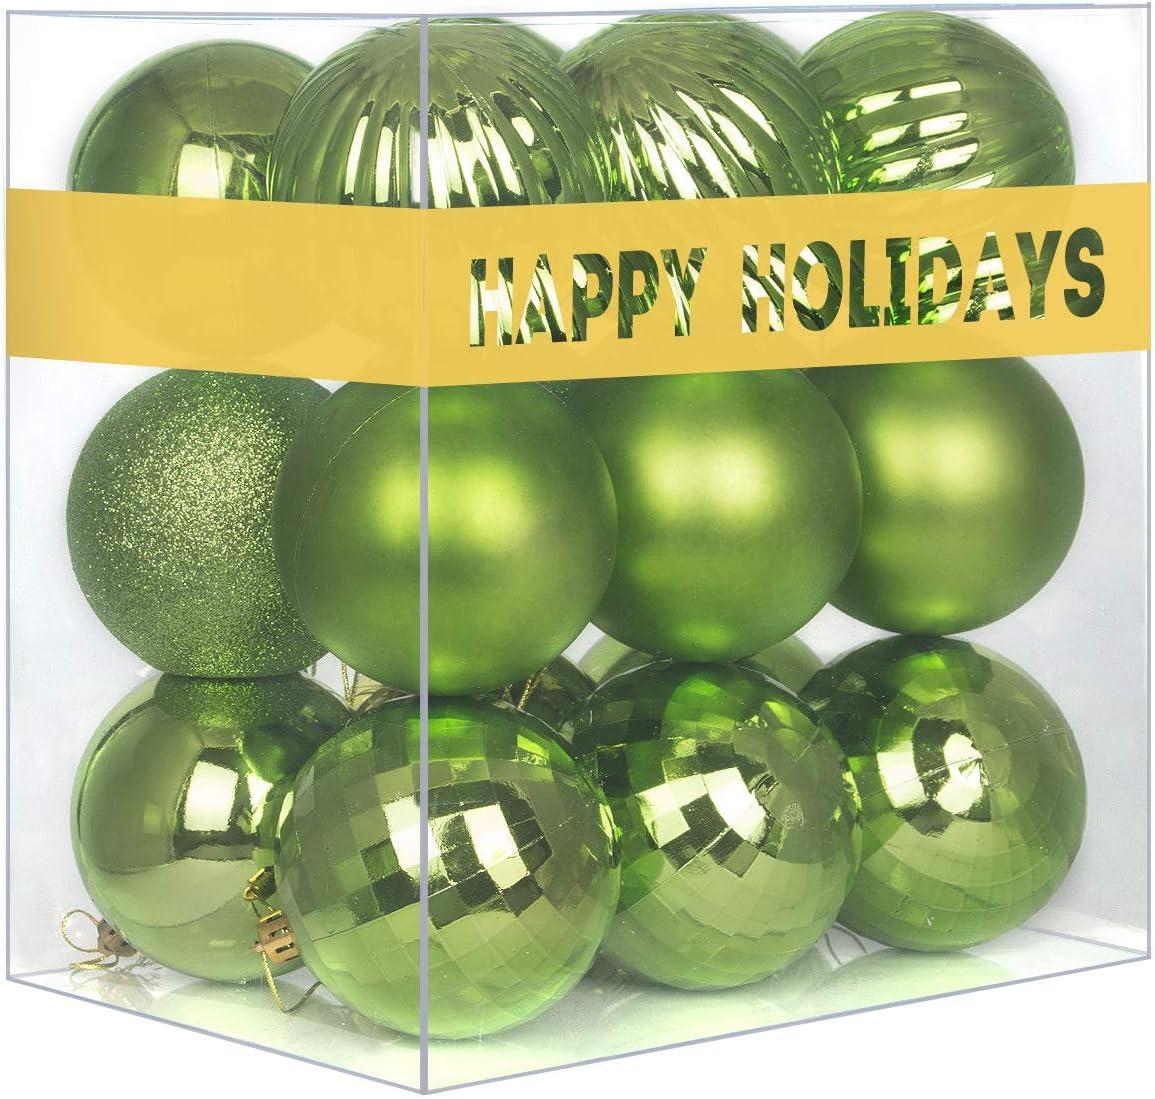 18Pcs Christmas Balls Ornaments for Xmas Tree - Shatterproof Christmas Tree Decorations Large Hanging Ball Lemon Green 2.5